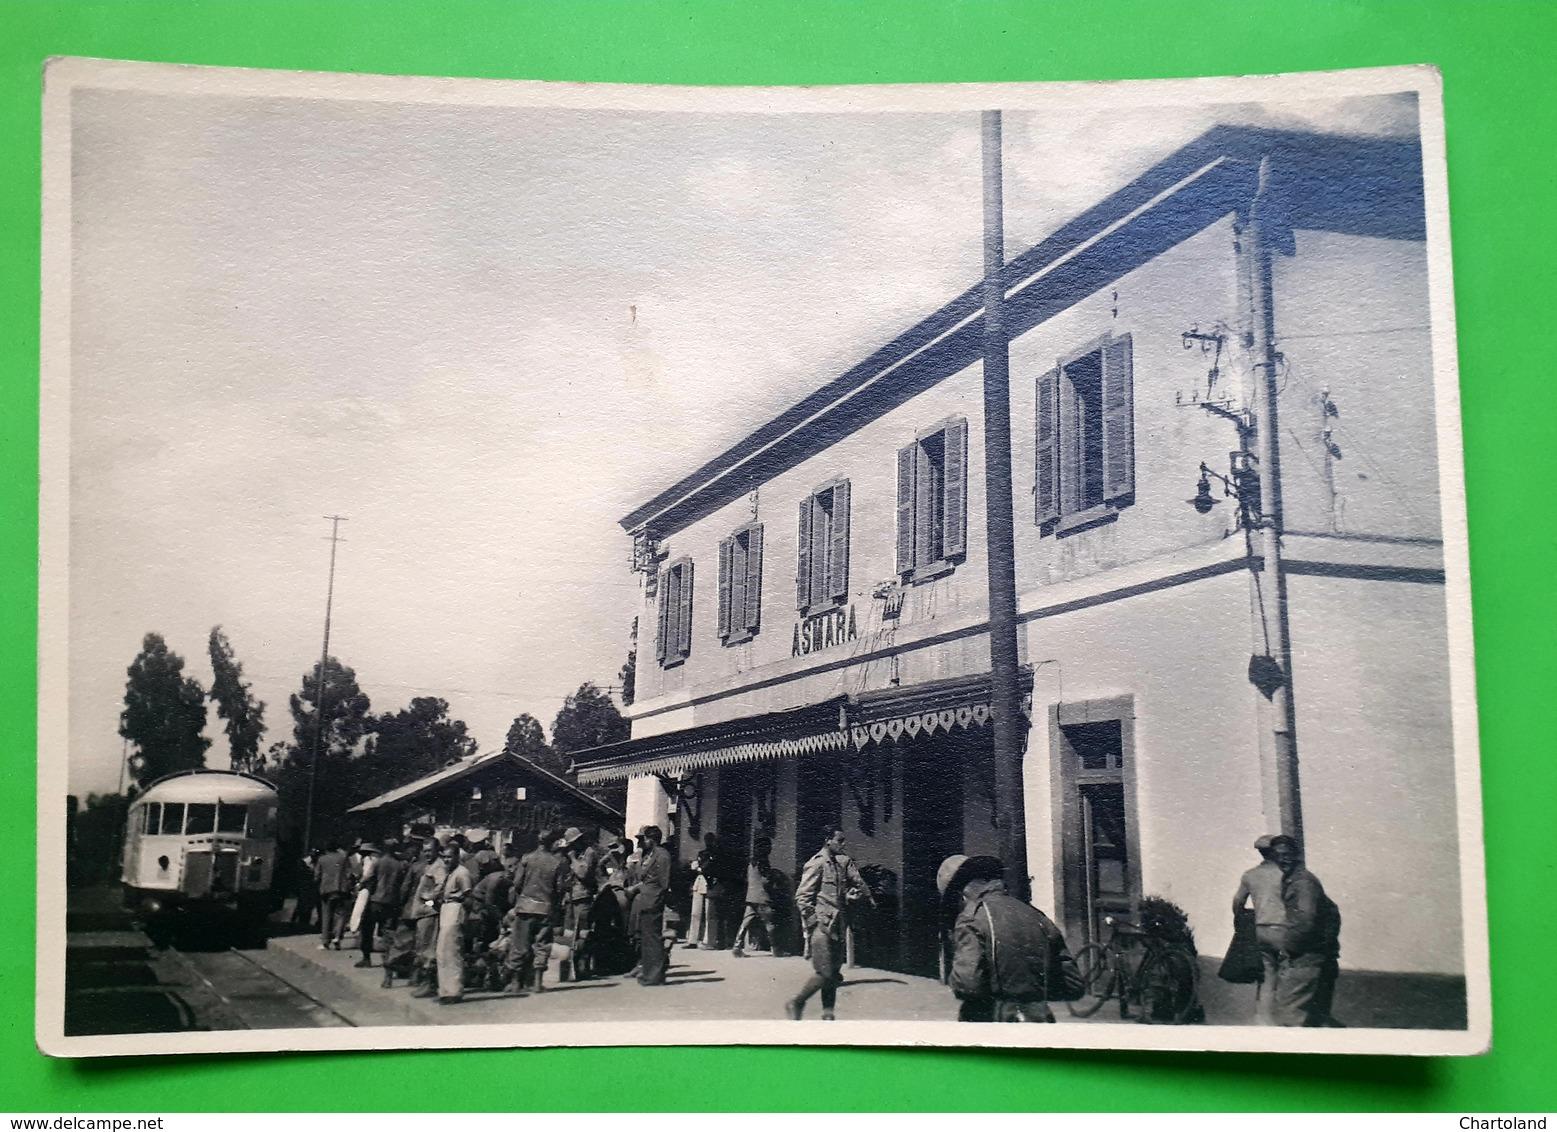 Cartolina - Asmara ( Eritrea ) - Stazione Ferroviaria - 1942 Ca. - Unclassified